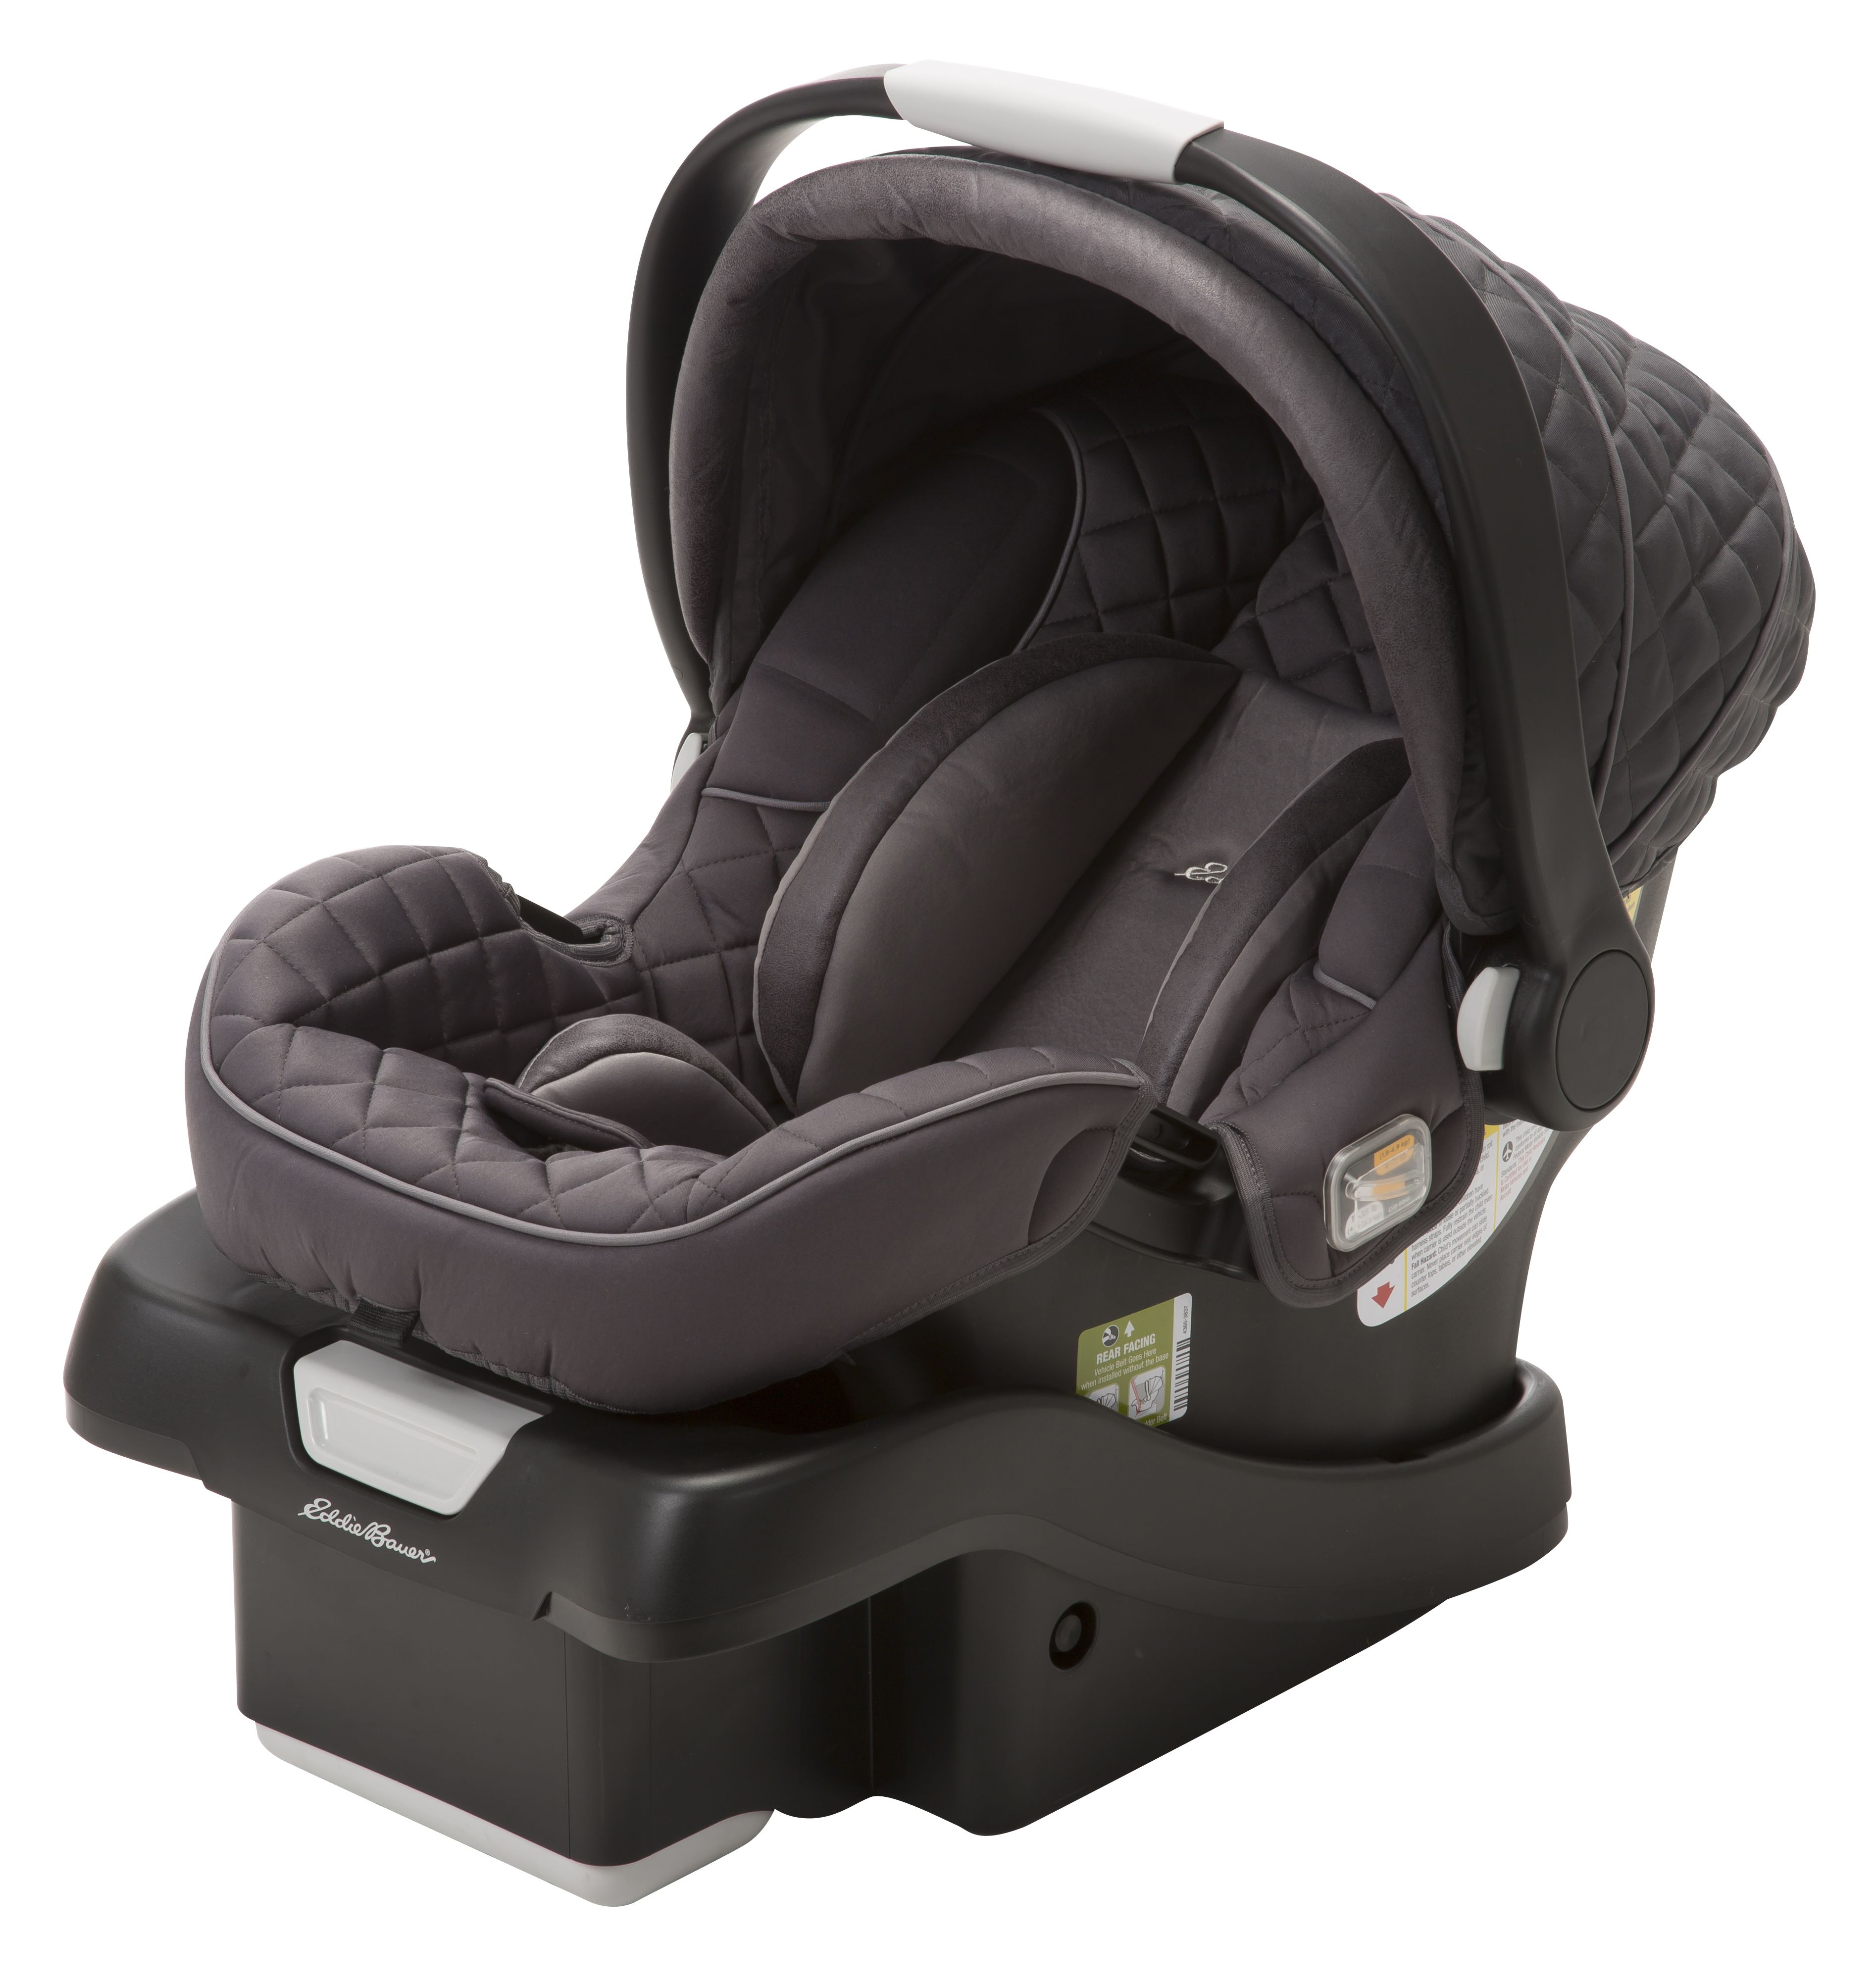 Eddie bauer surefit infant car seat target exclusive eb graphite